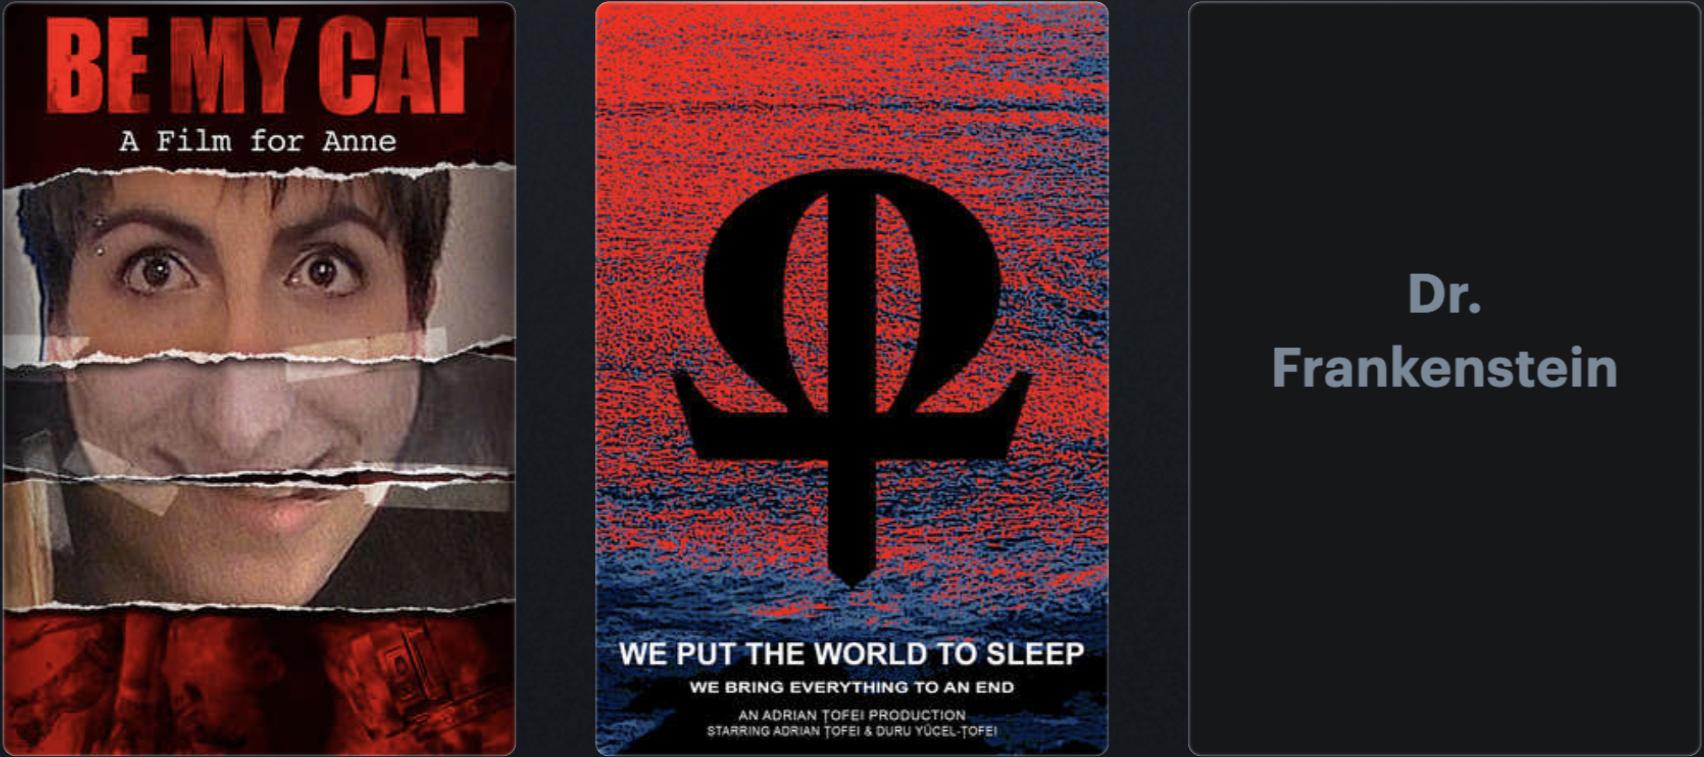 We Put the World to Sleep